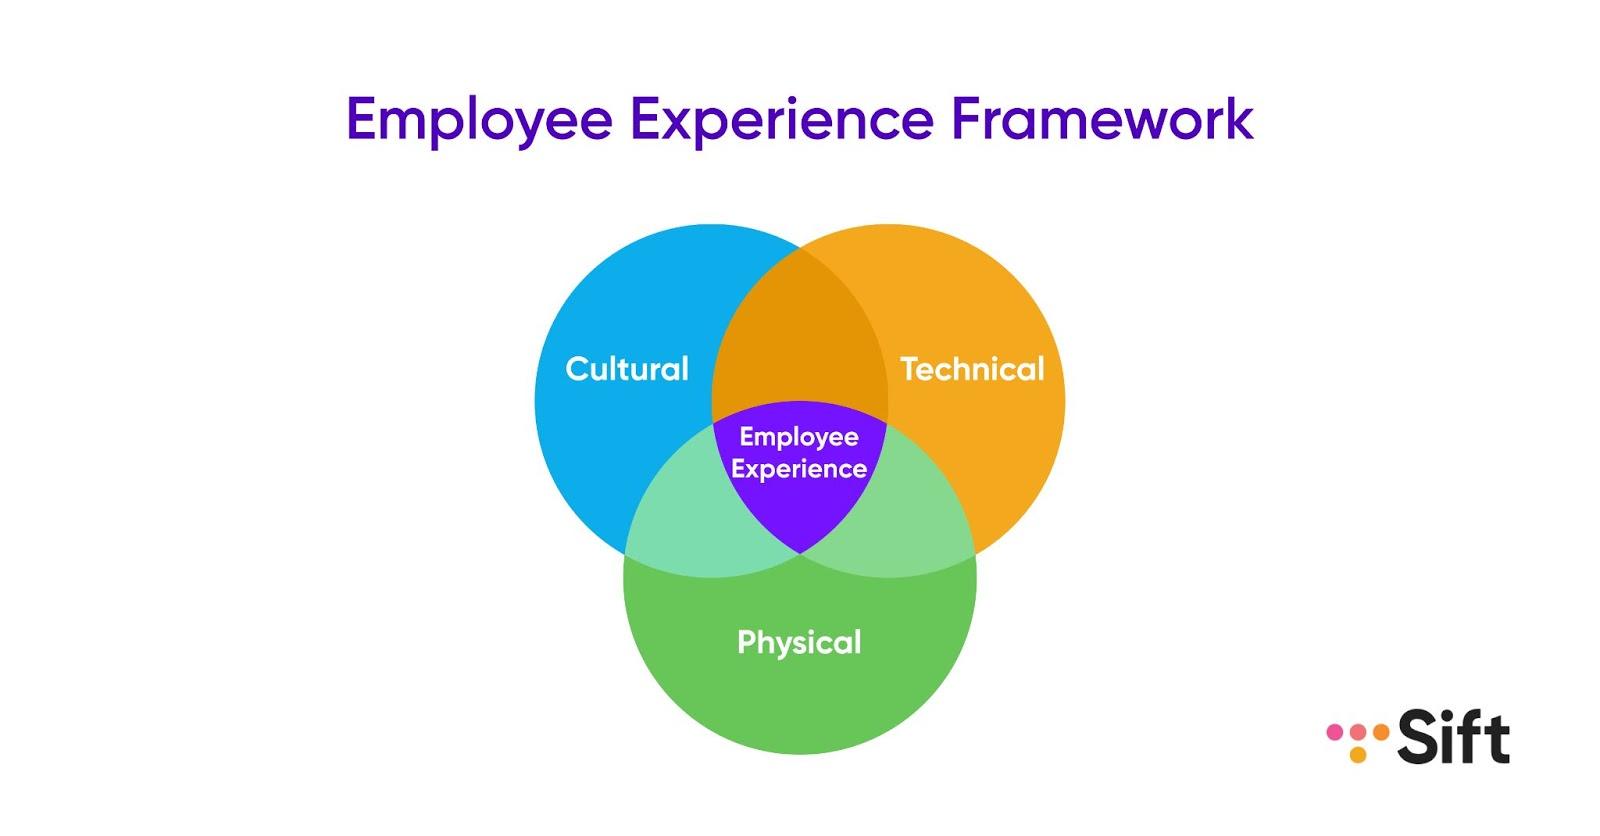 Sift employee experience framework